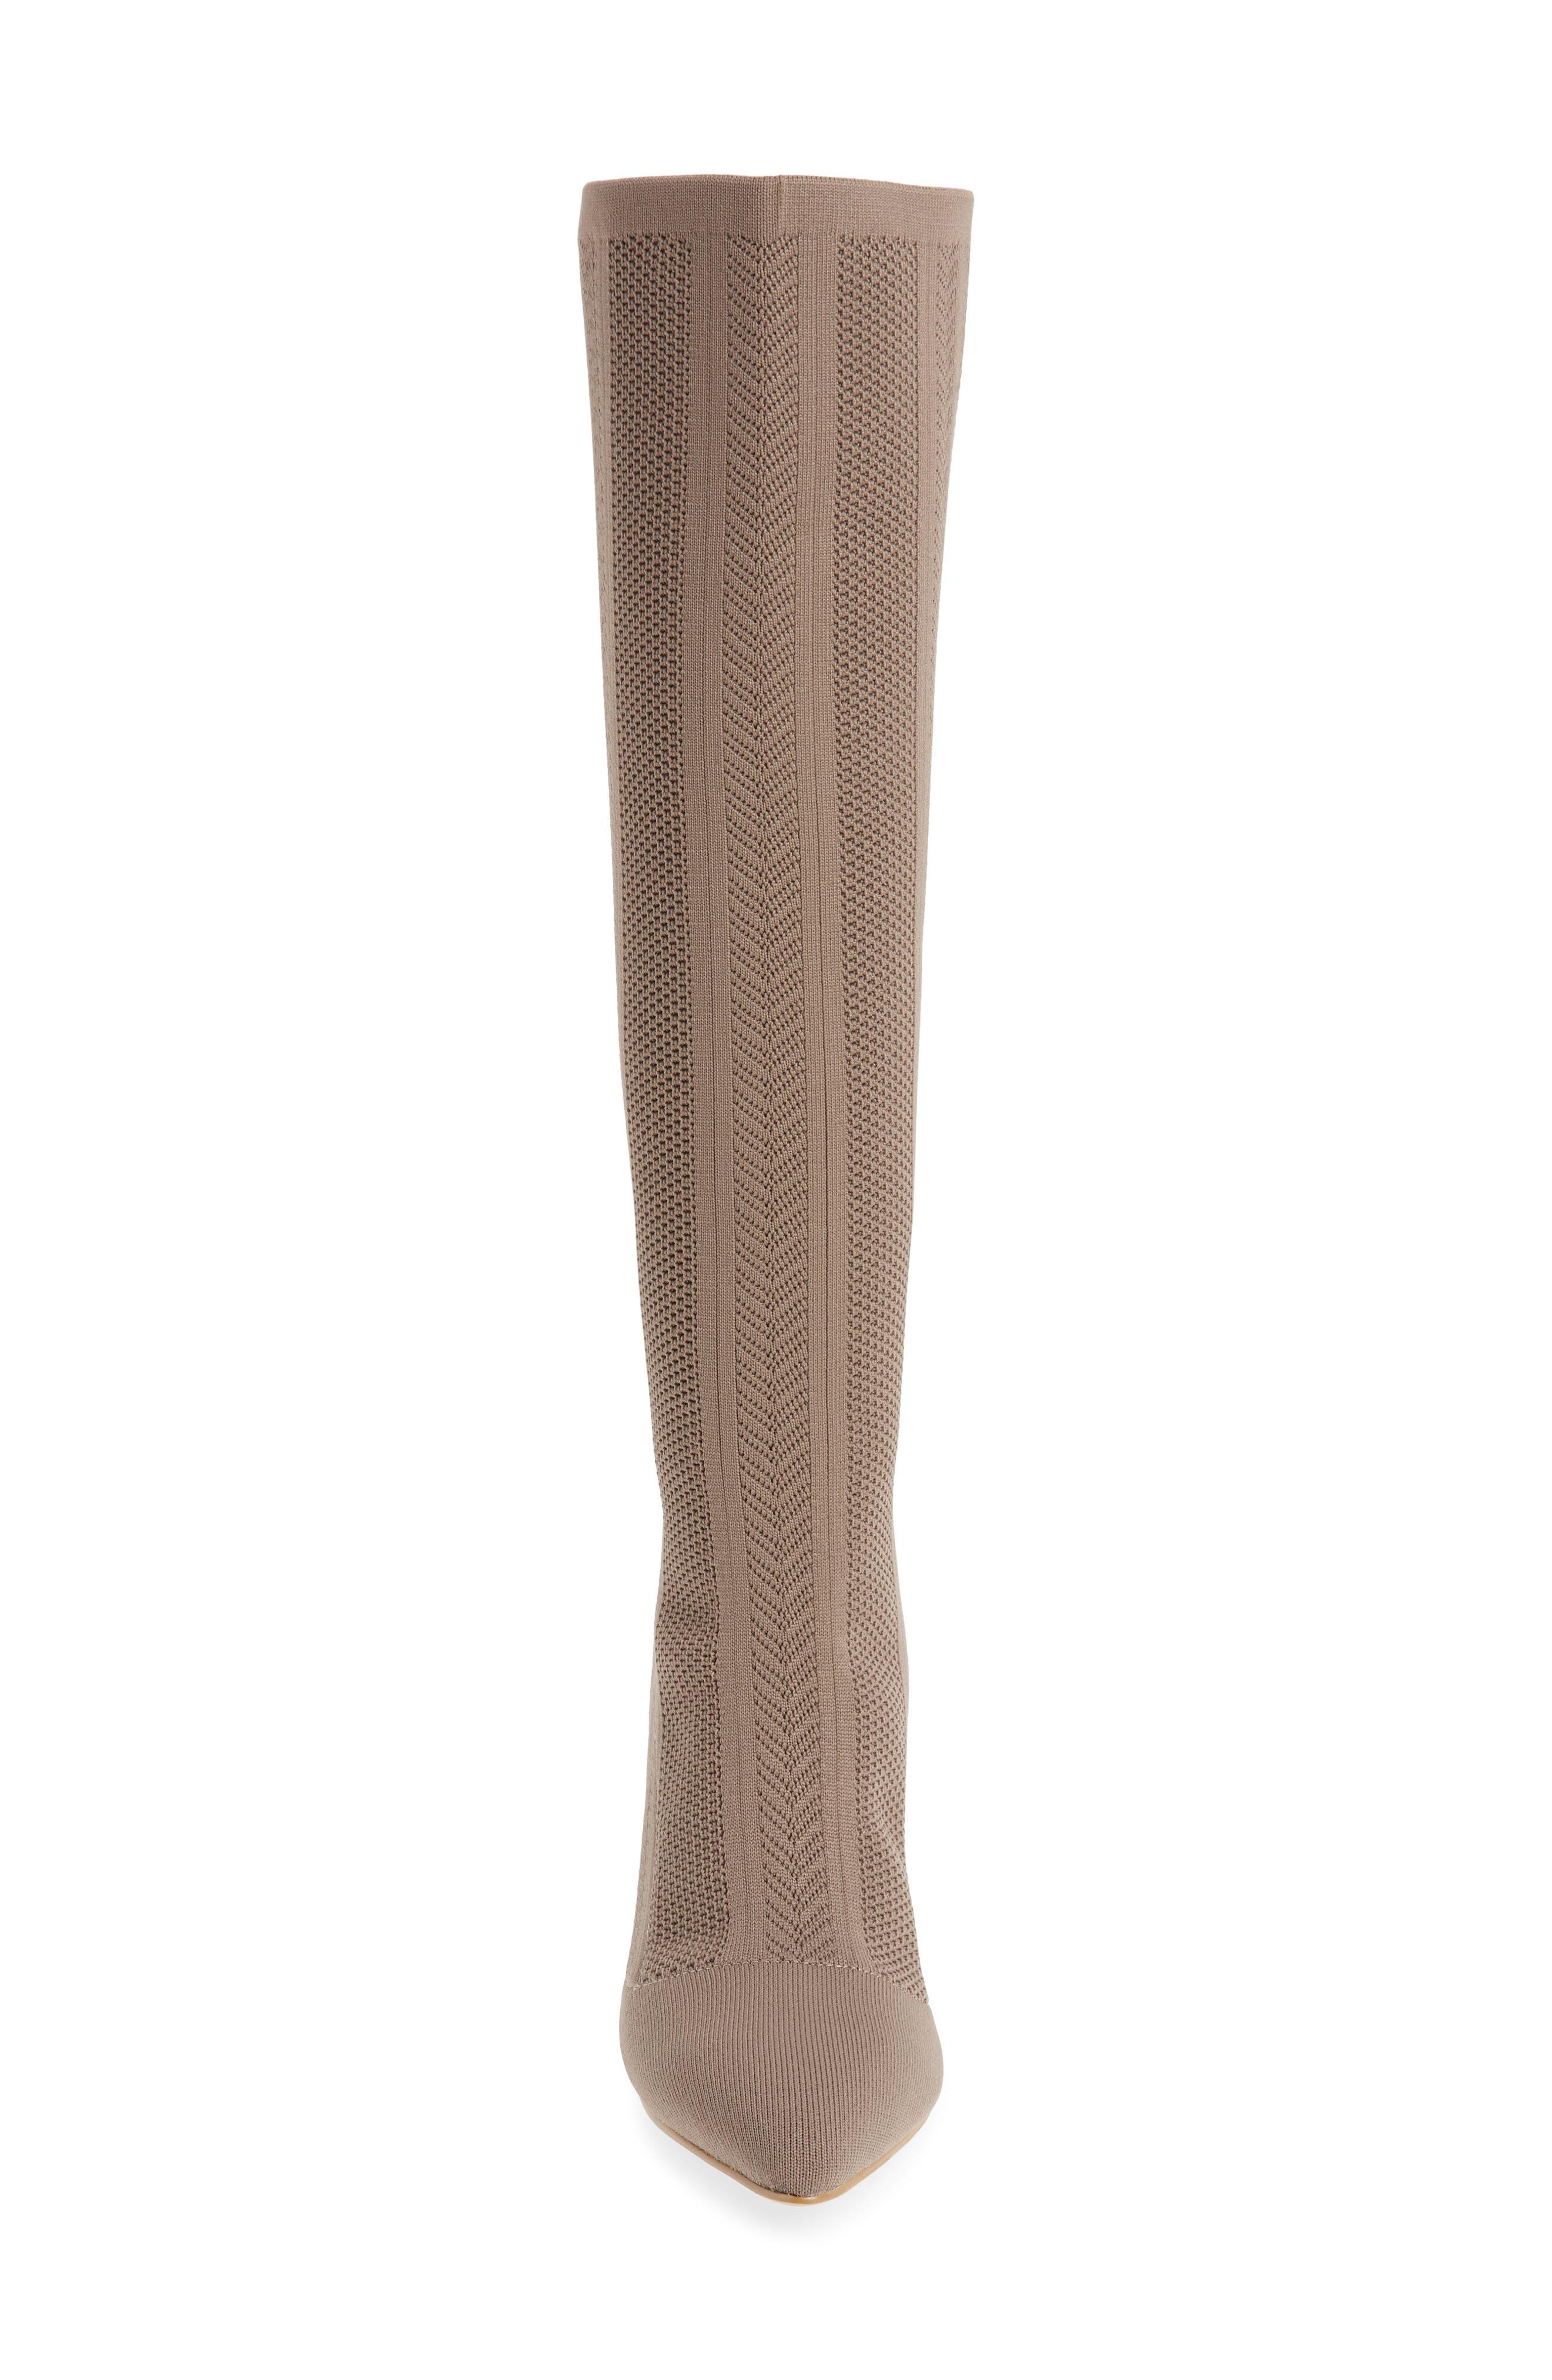 Davis Knit Boot,                             Alternate thumbnail 4, color,                             020